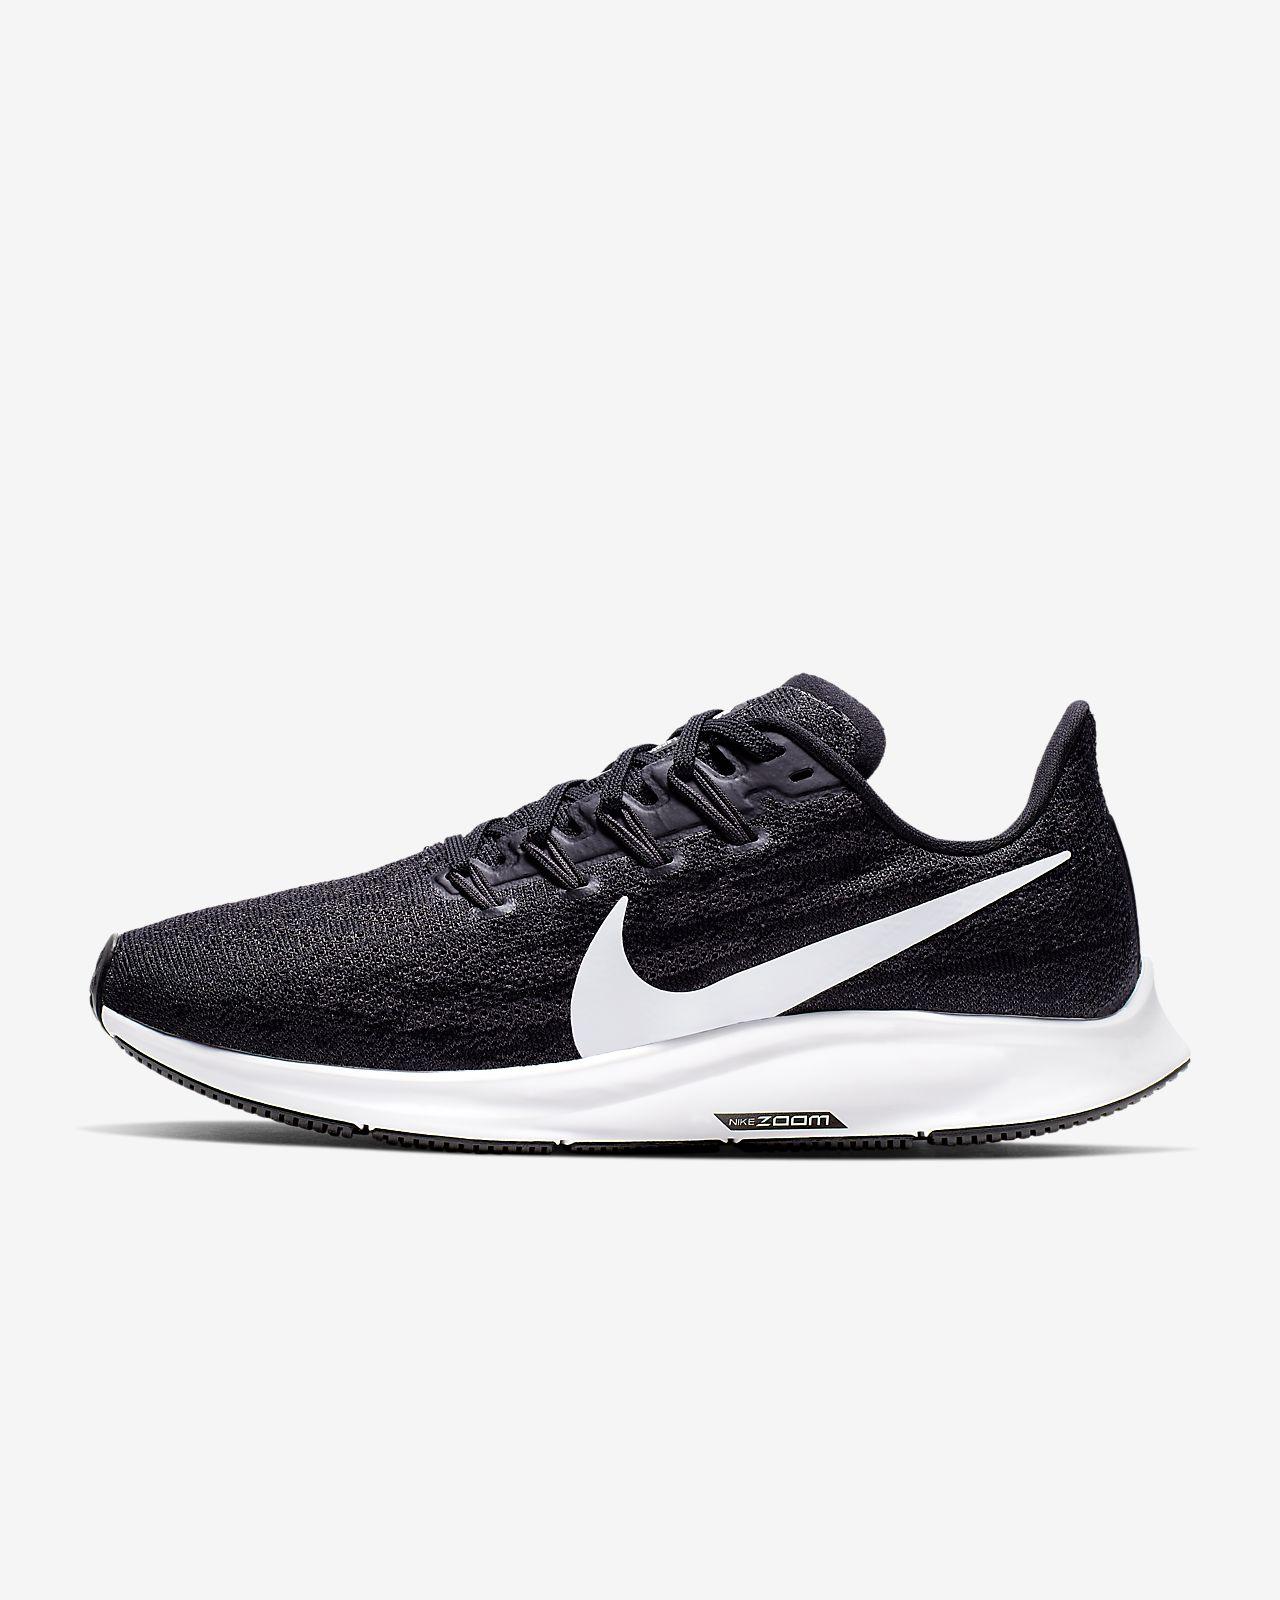 Calzado de running para mujer Nike Air Zoom Pegasus 36 (ancho)